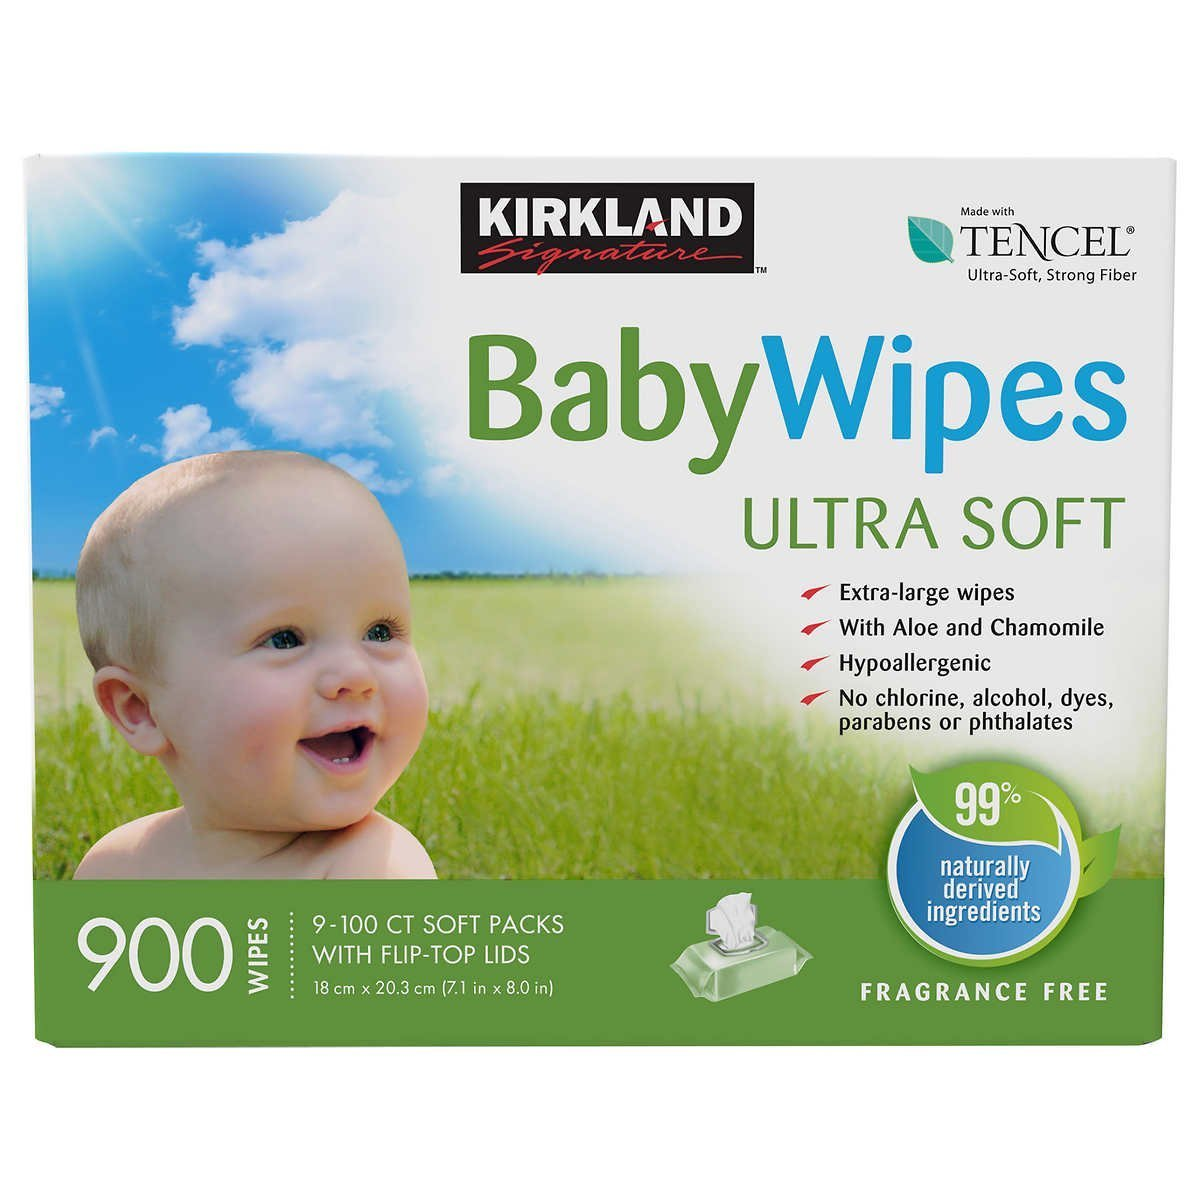 Kirkland Signature Baby Wipes (900 Wipes) by Kirkland Signature